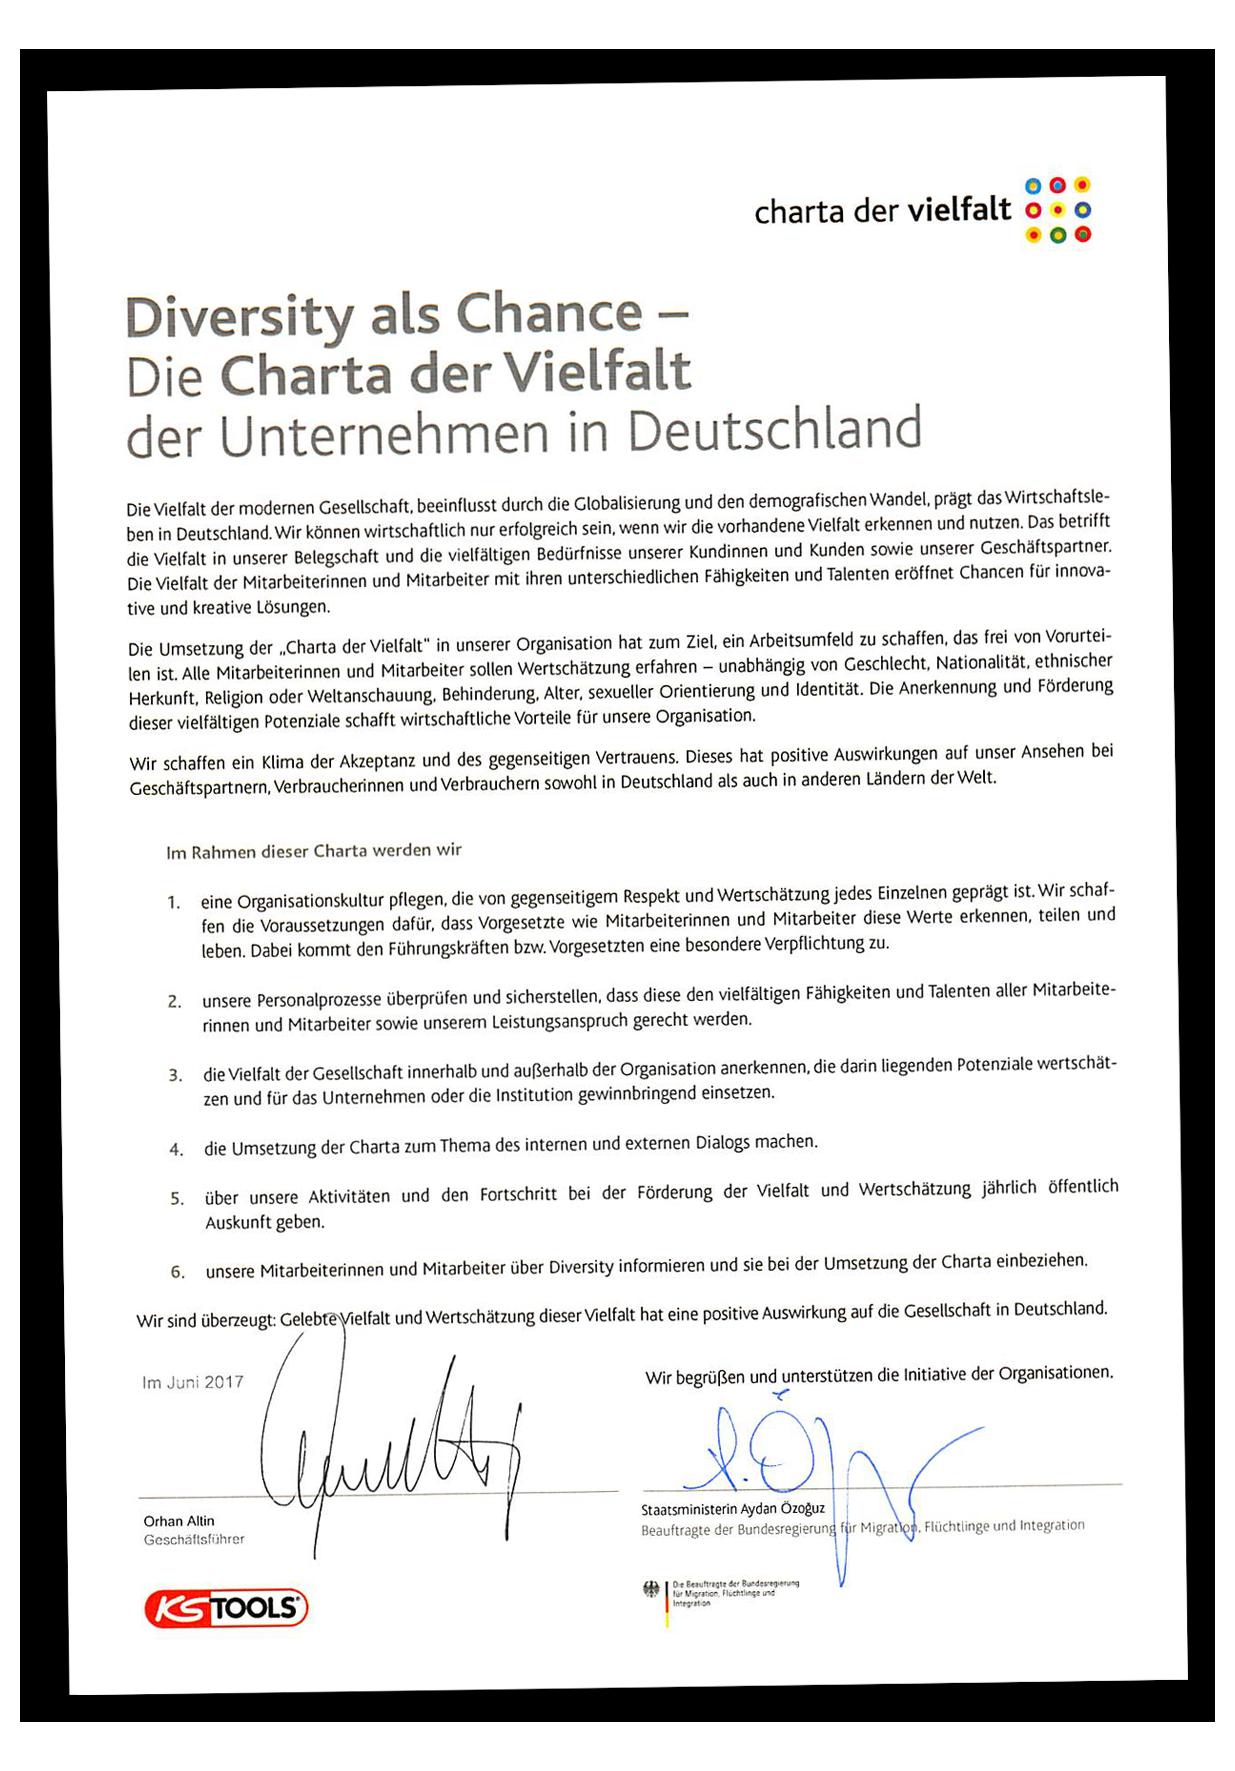 Besondere Len the diversity charter ks tools werkzeuge maschinen